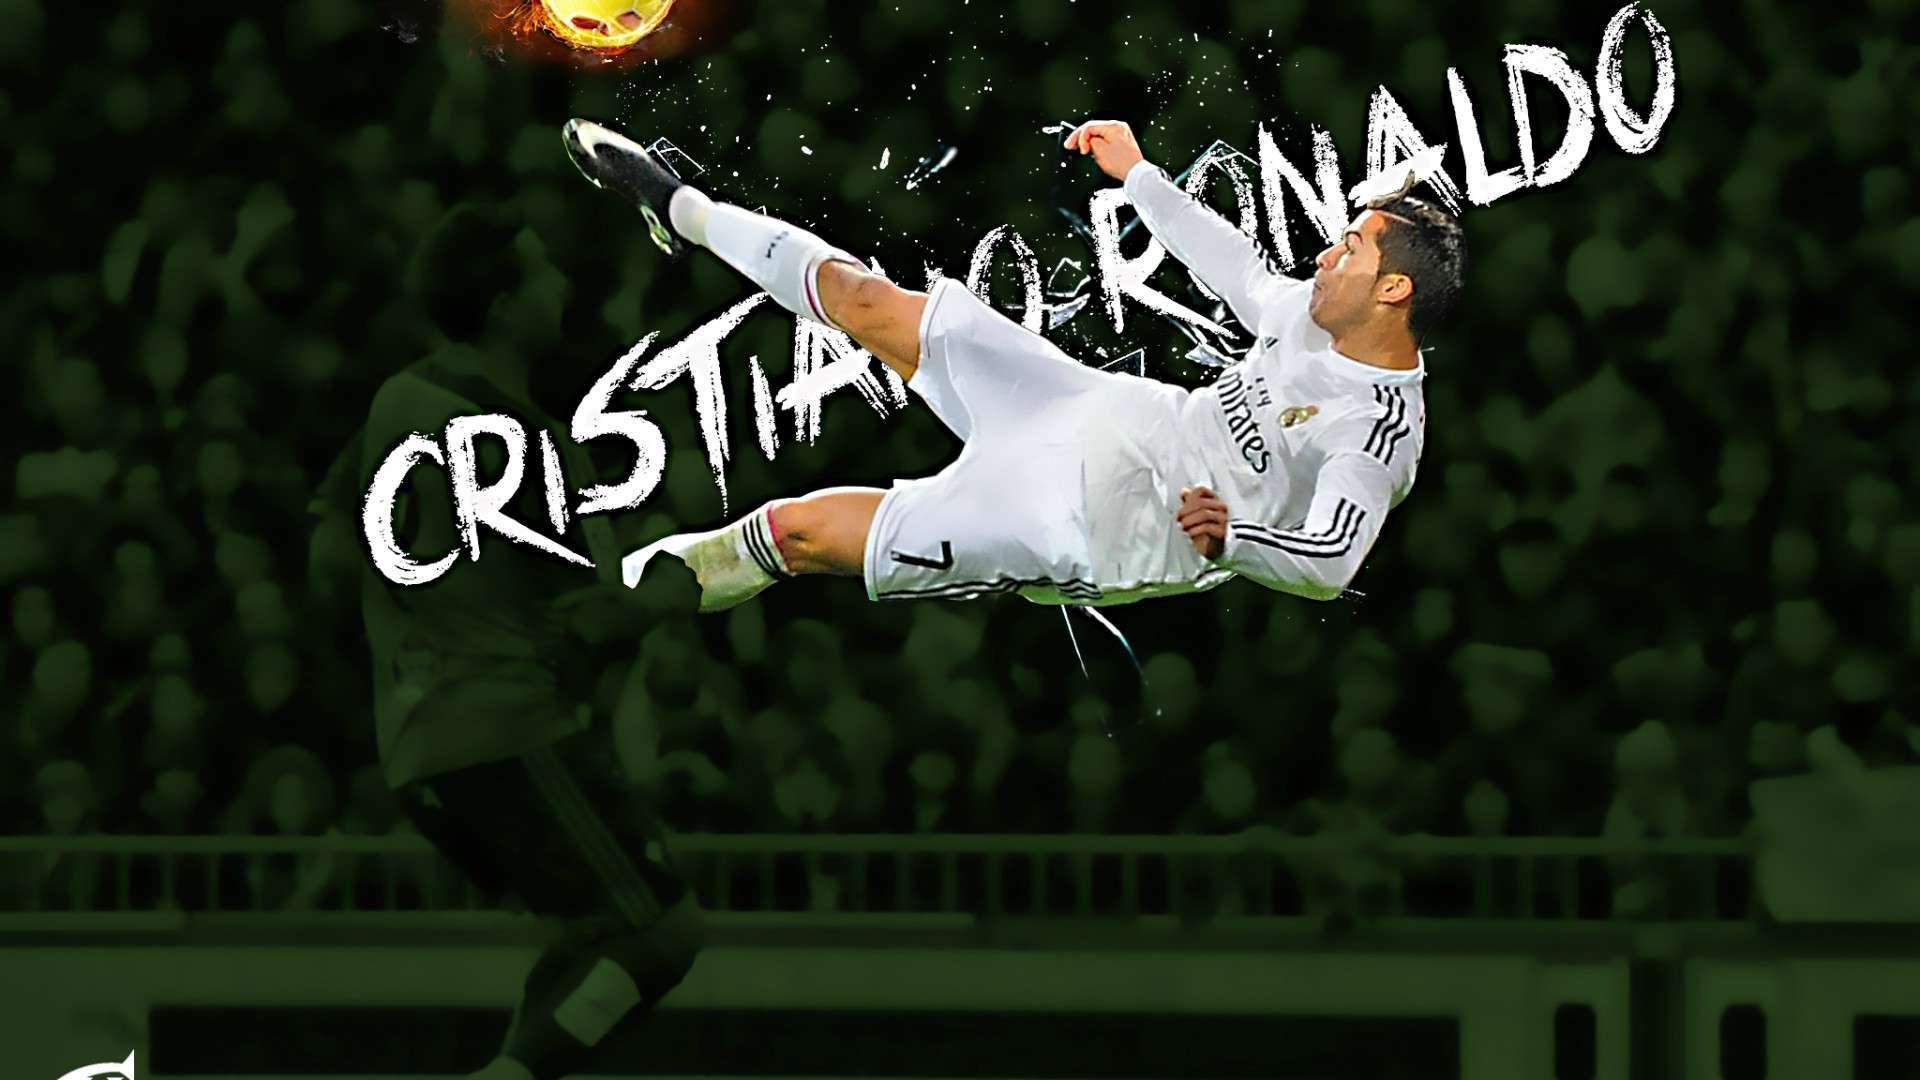 1920x1080 Cristiano Ronaldo hình nền.  Hình nền Cristiano Ronaldo HD